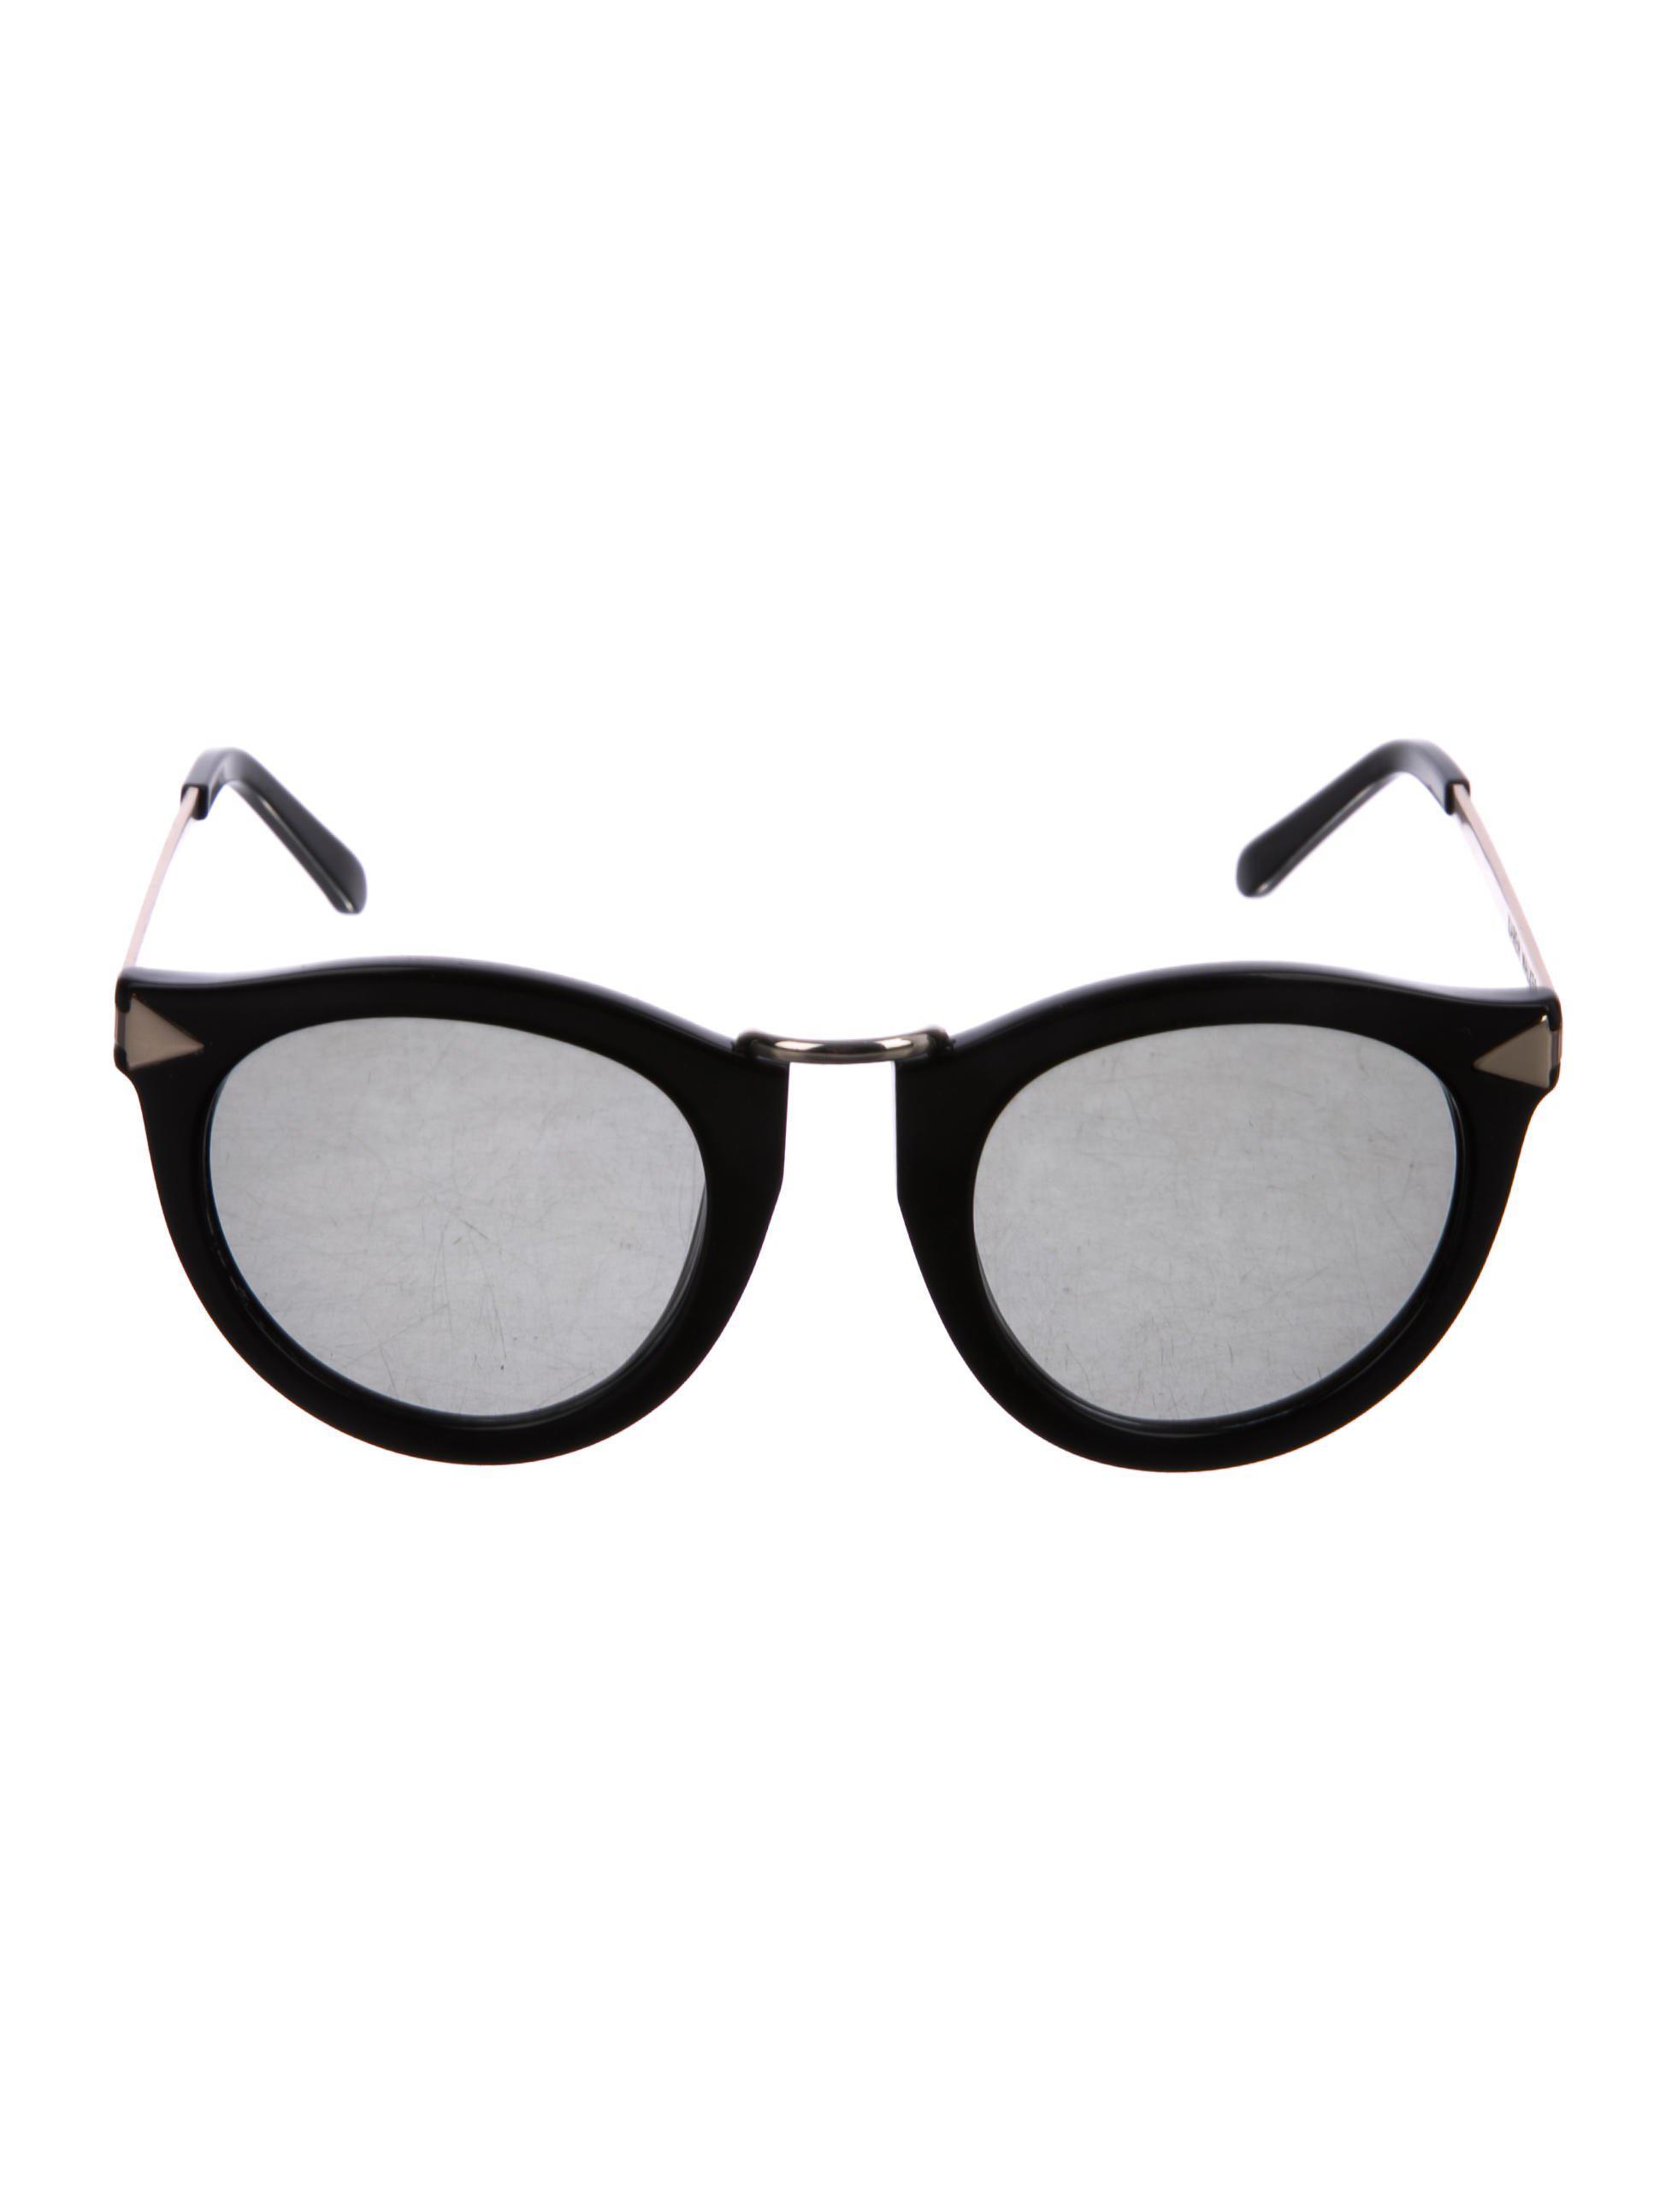 97d7a3921cf Lyst - Karen Walker Harvest Tinted Sunglasses Black in Metallic